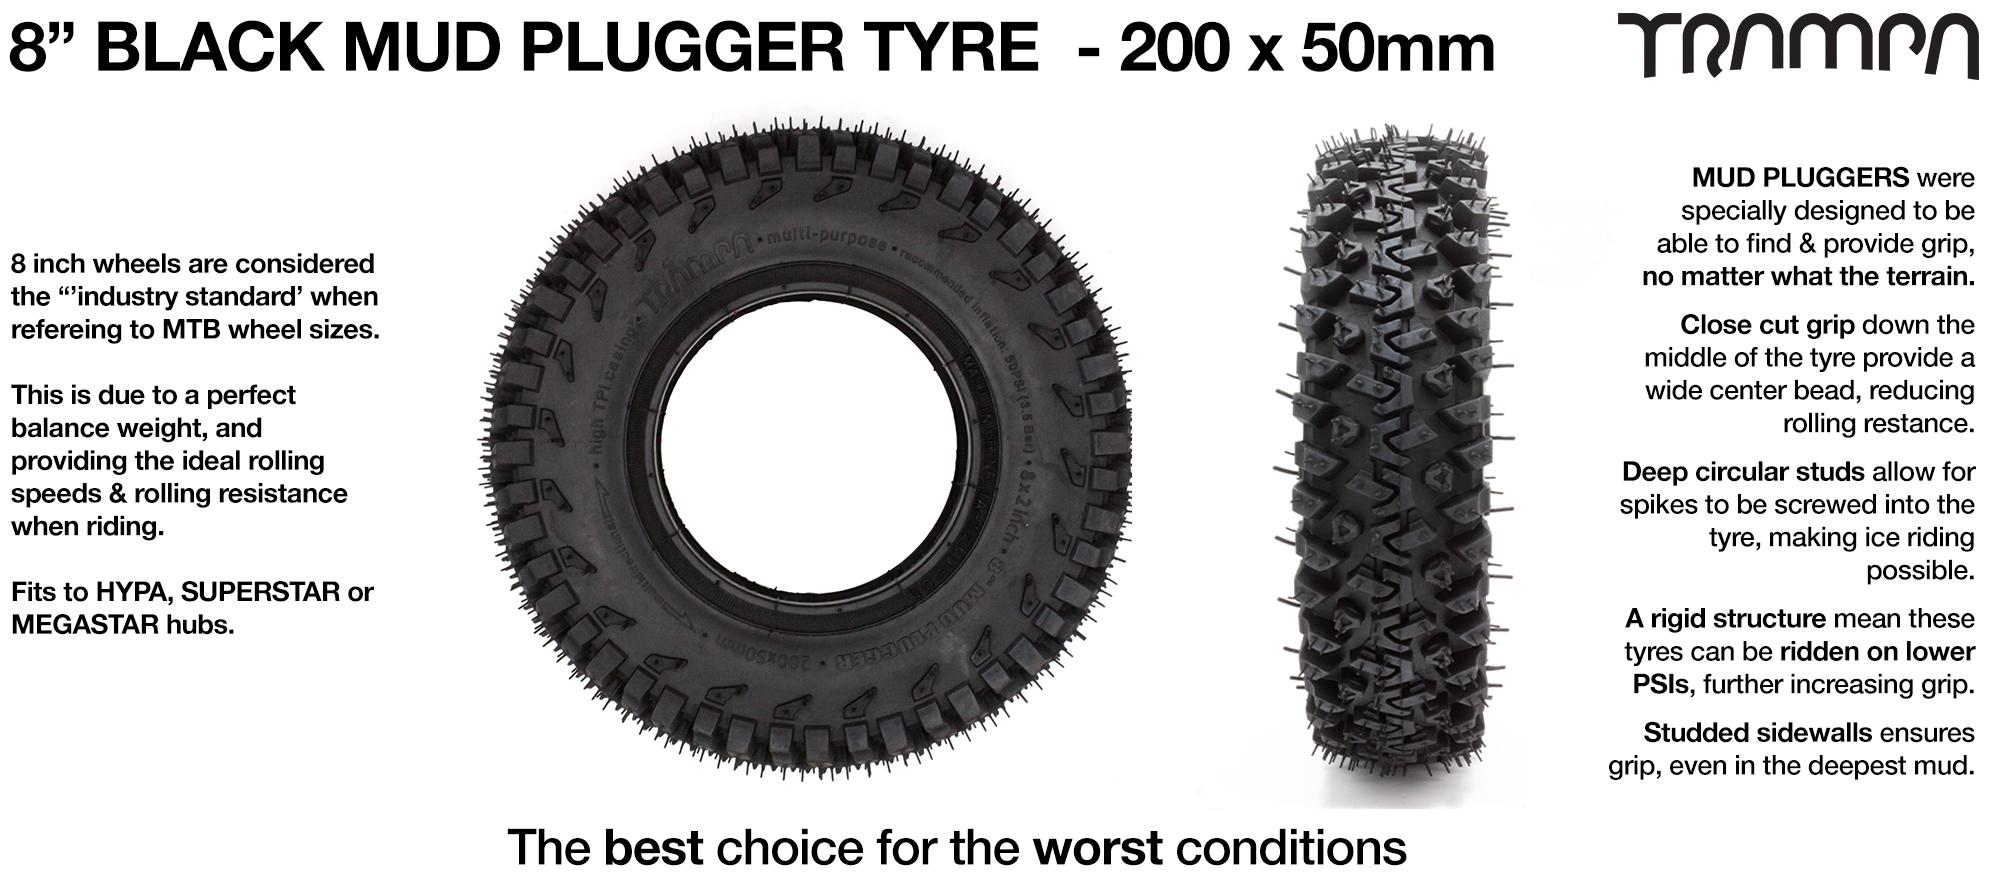 TRAMPA Mudplugger Tyre - BLACK 8 inch